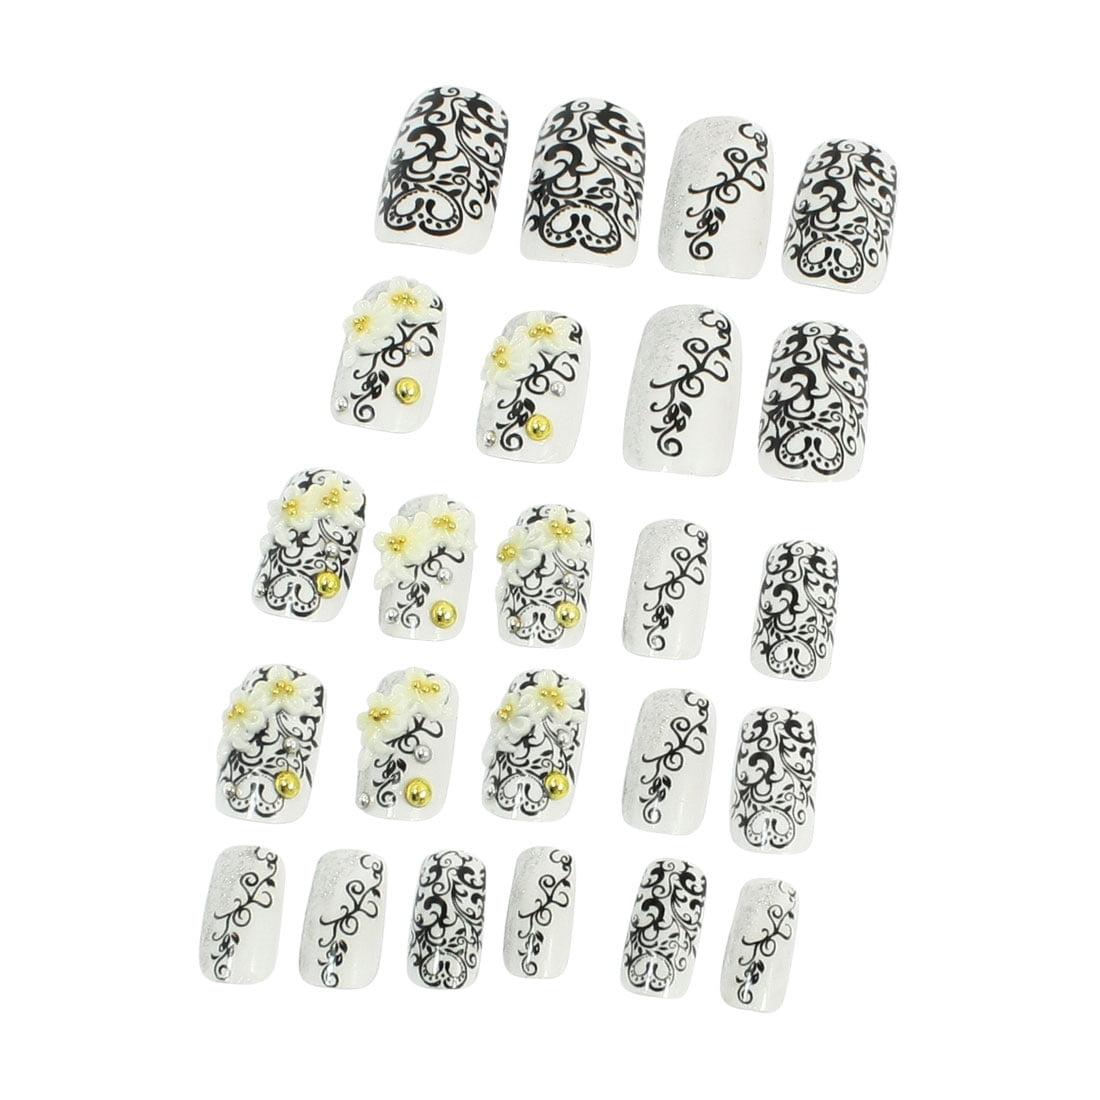 Unique Bargains 24 x Self-Adhesive 5 Different Sizes Plastic Artificial Nails Tips Black White